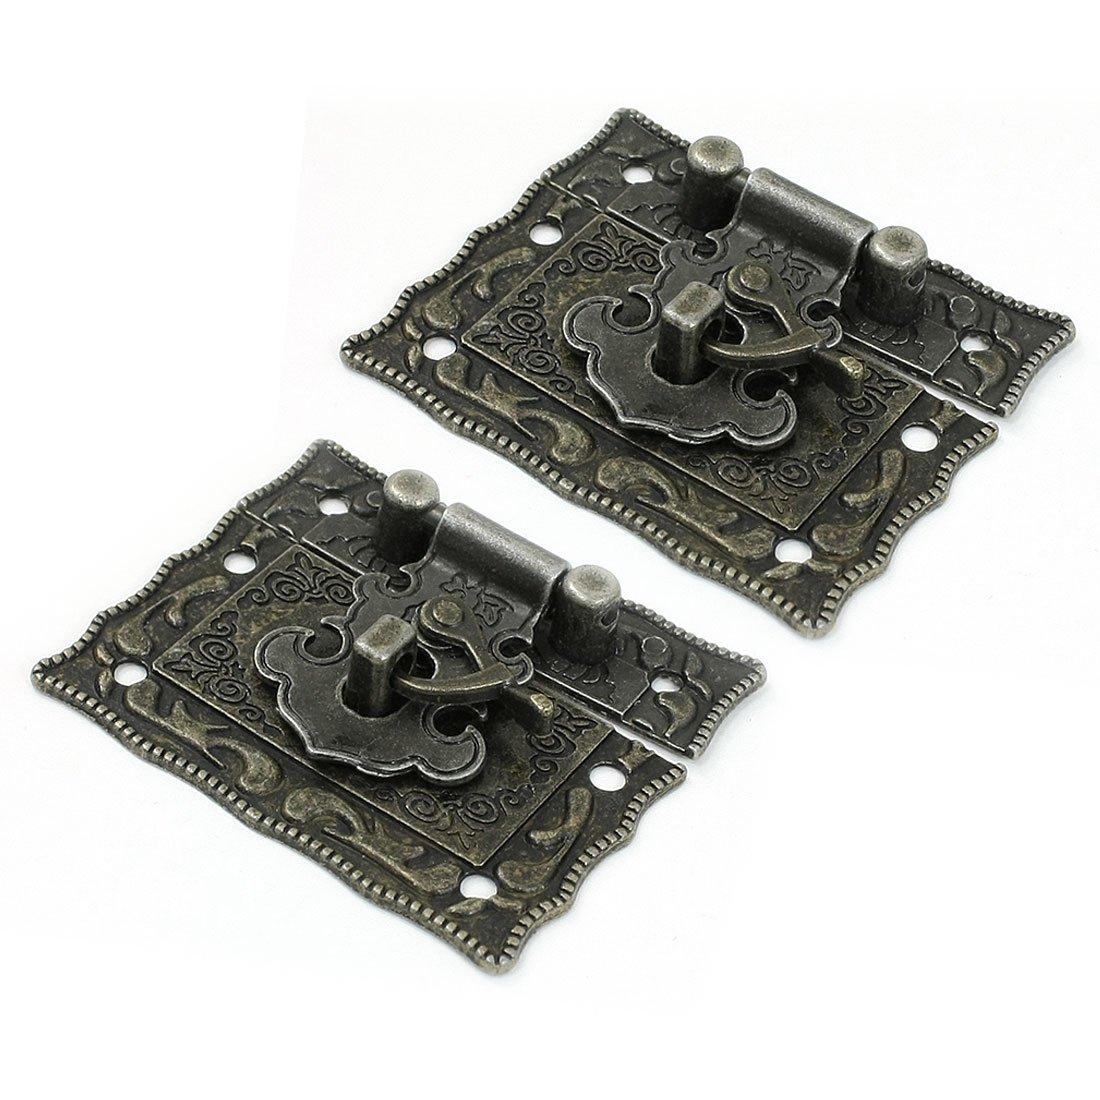 Pigupup Detector de Billetes port/átil 60X Lupa de Bolsillo Mini Lupa del microscopio UV joyero Lupa con luz LED